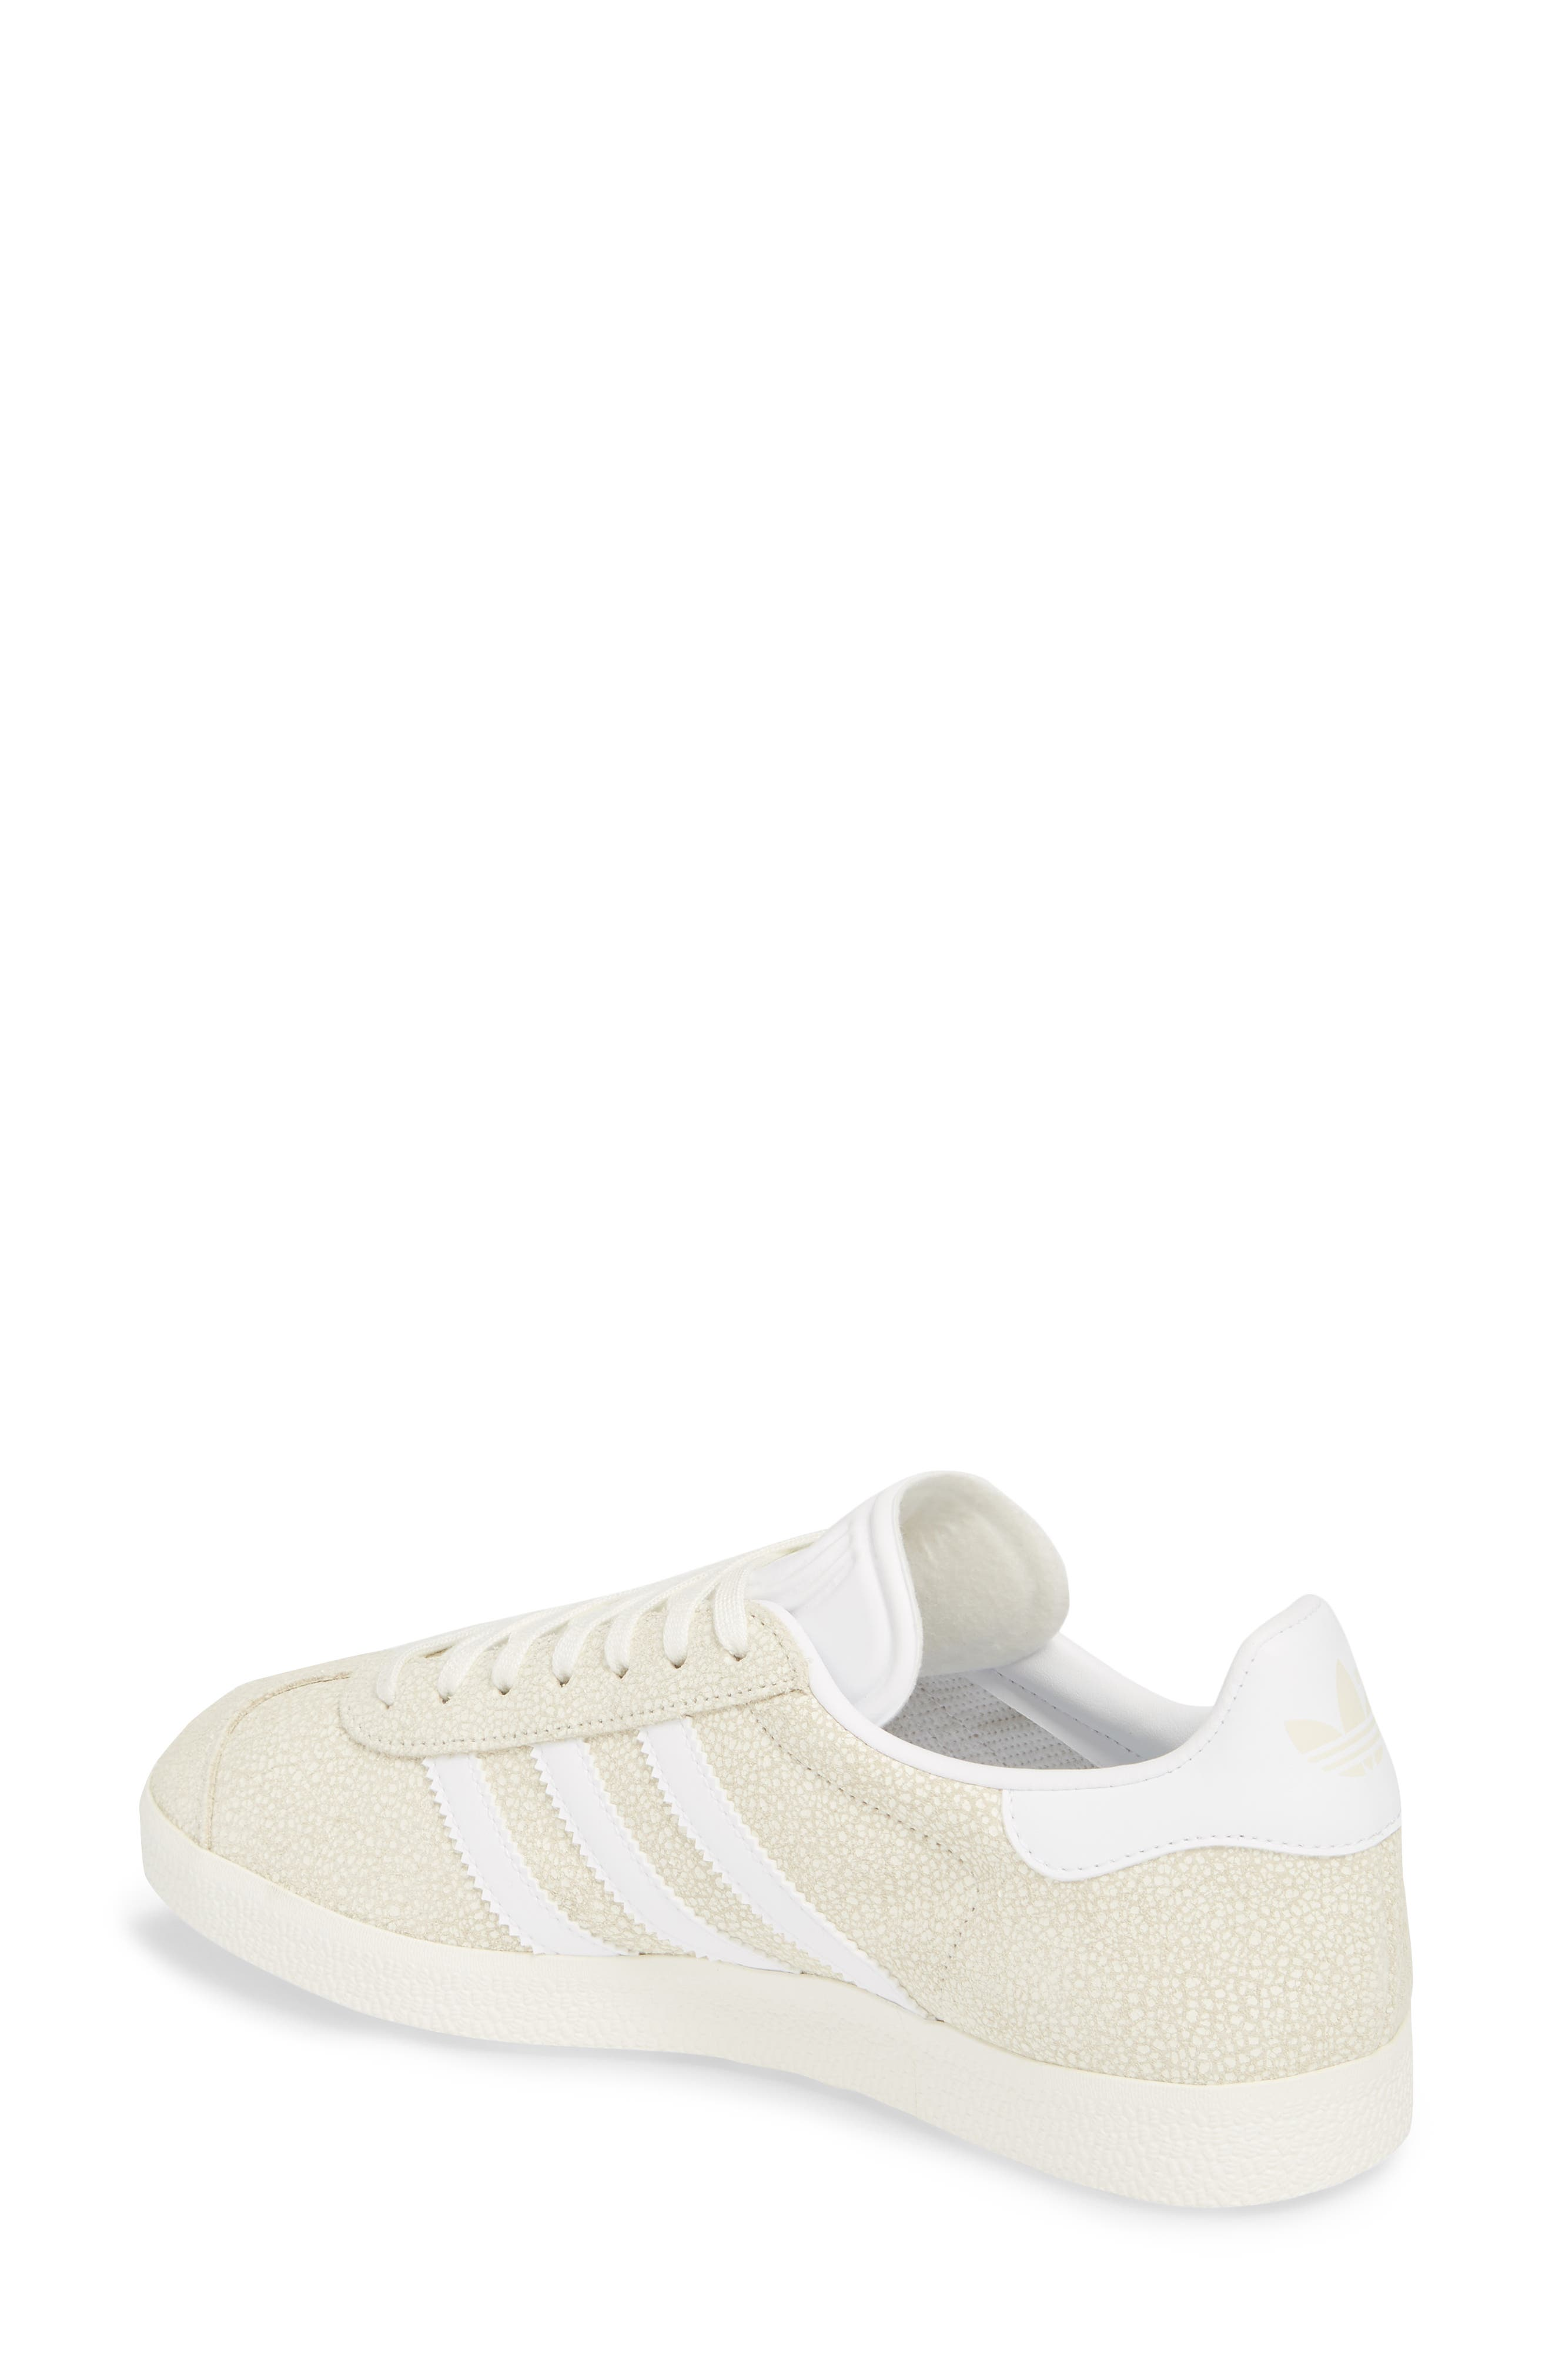 Gazelle Sneaker,                             Alternate thumbnail 2, color,                             OFF WHITE/ WHITE/ OFF WHITE